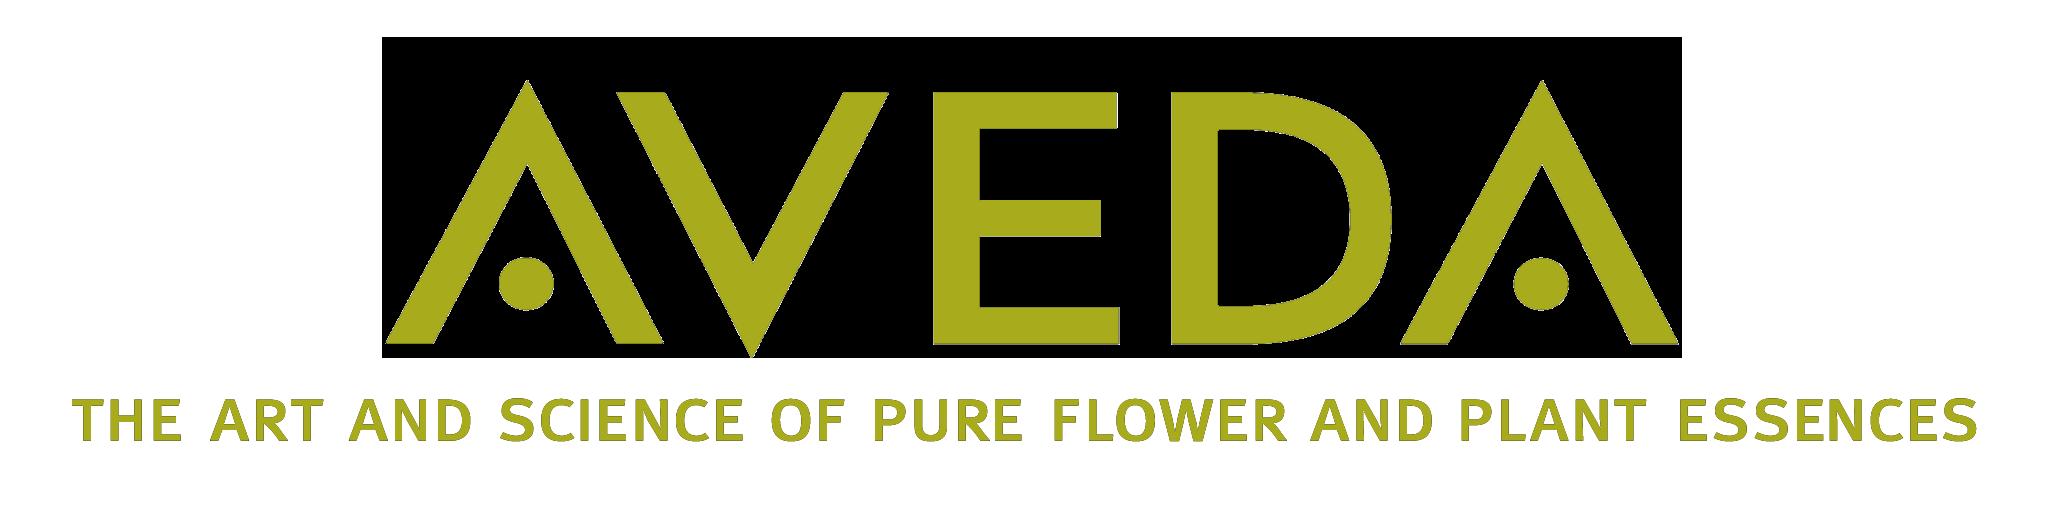 Aveda Logos Download